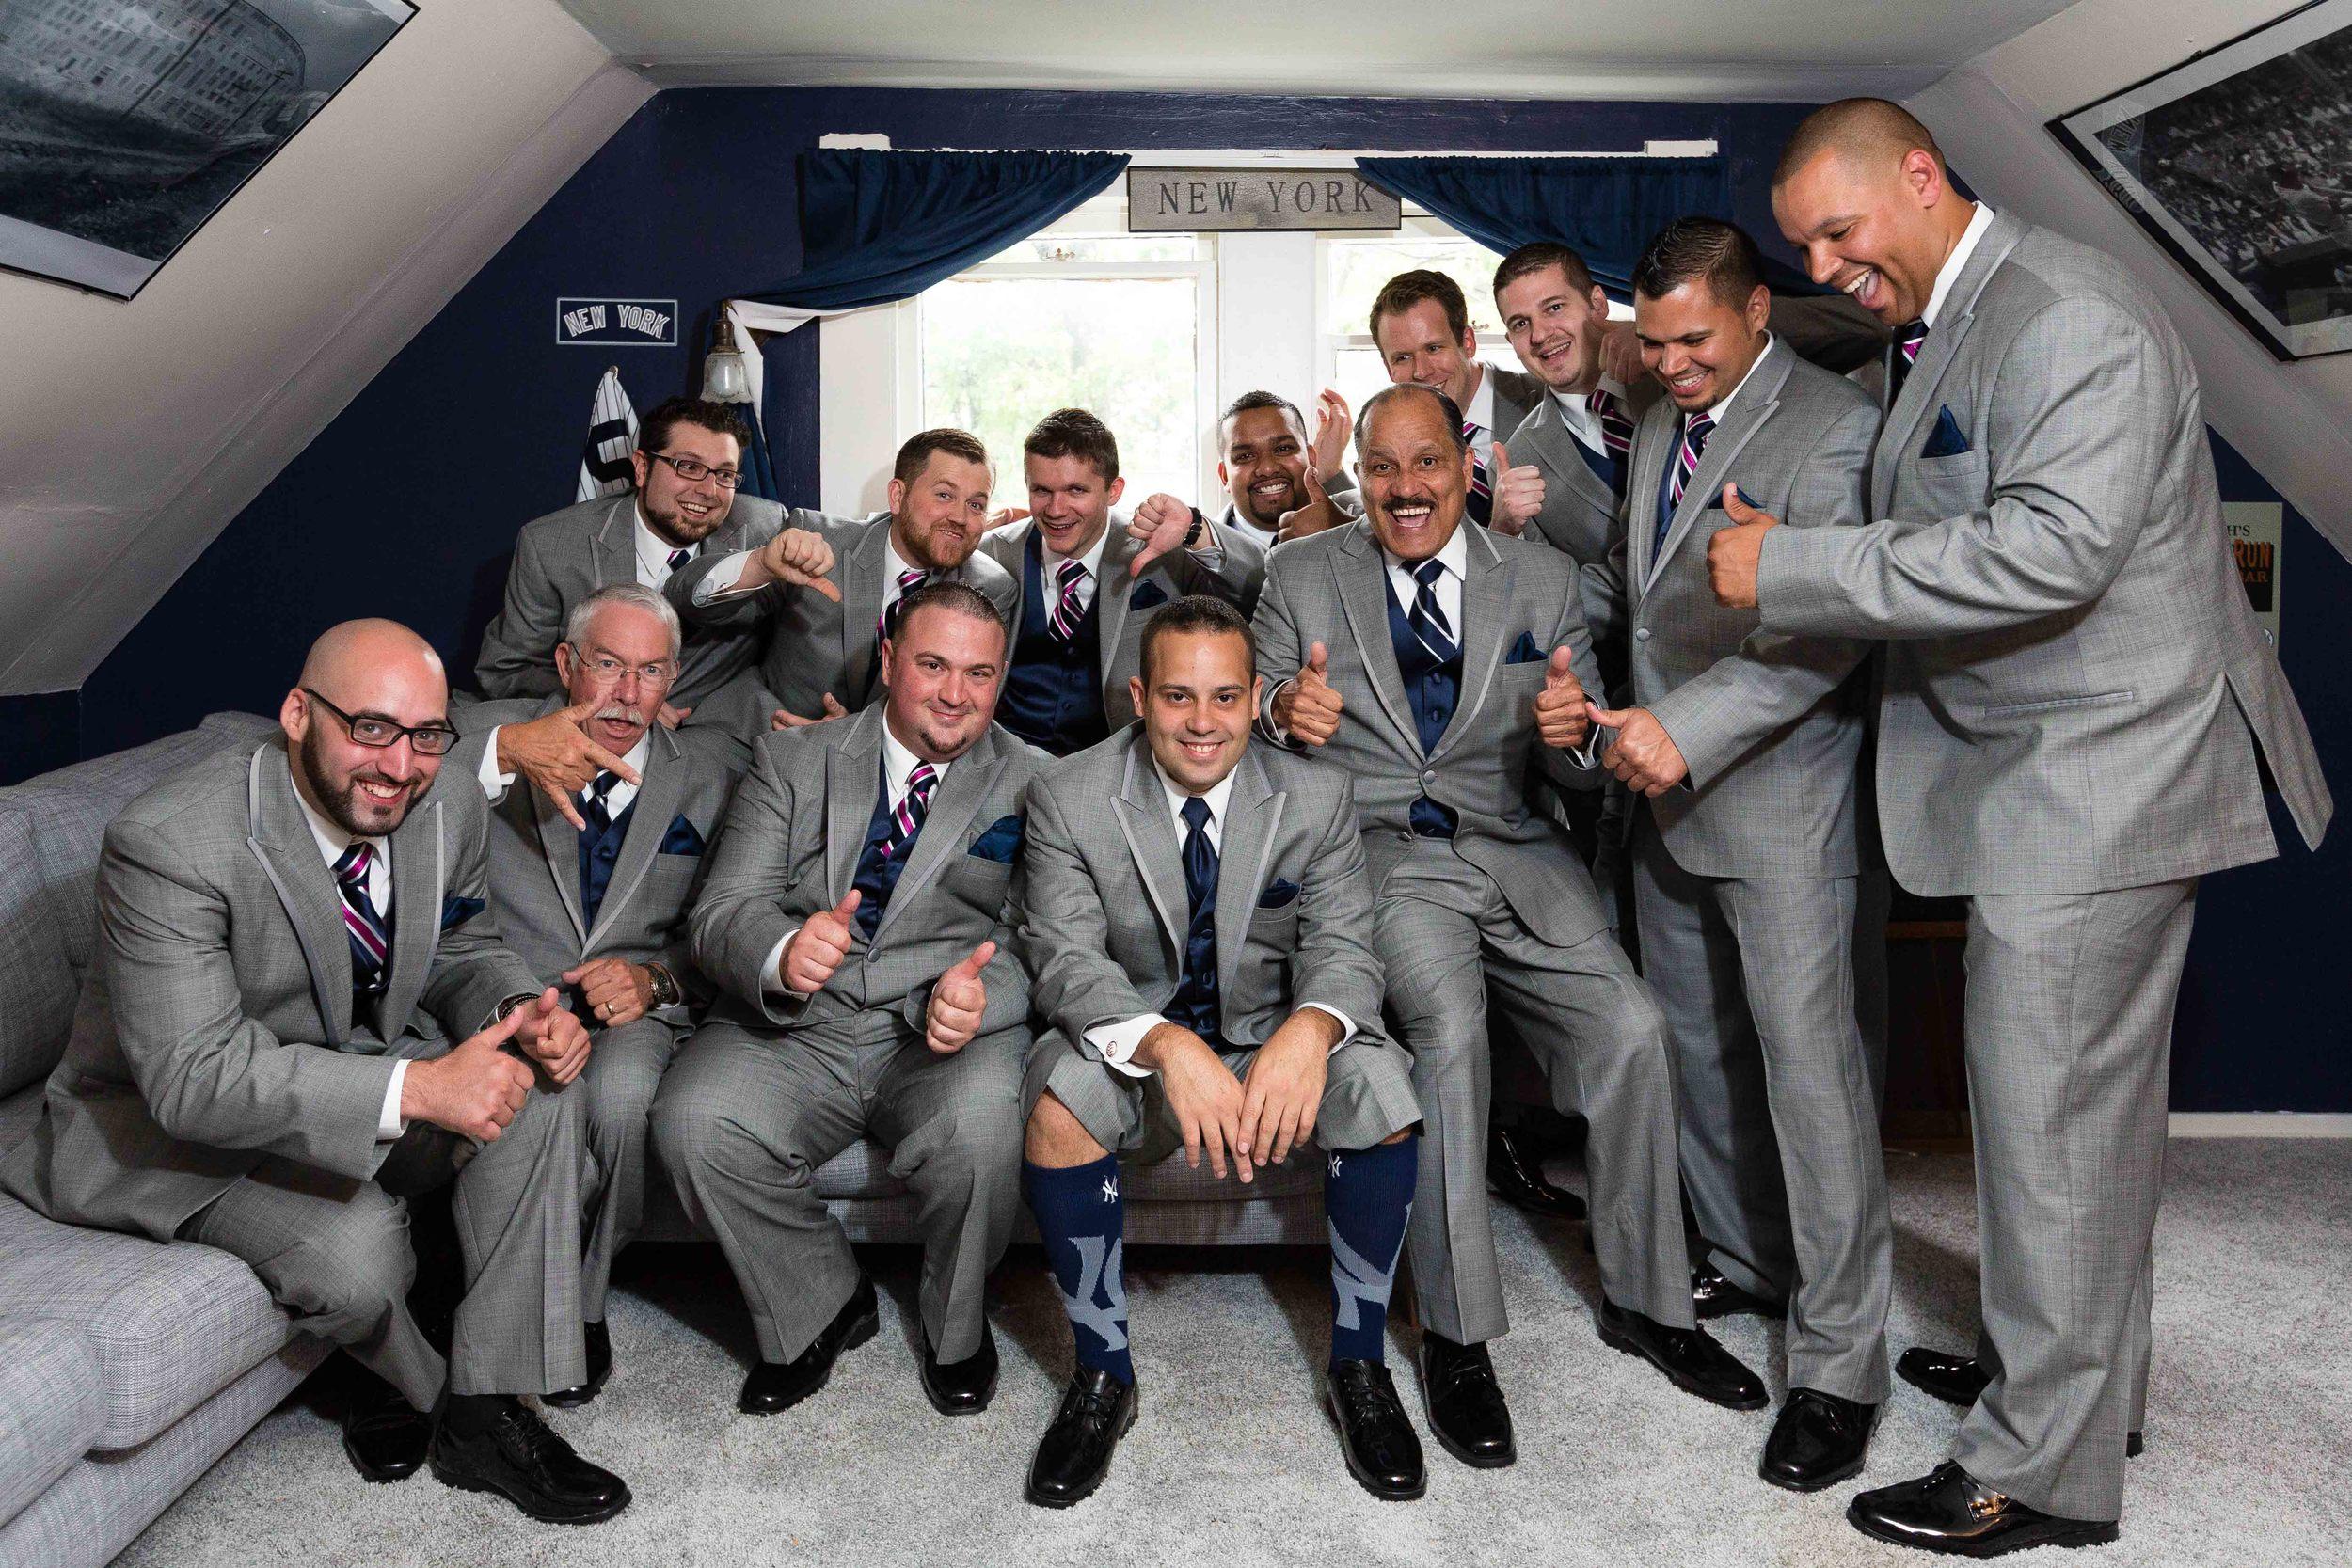 Puerto-Rican-Wedding-Hartford-City-Hall-Connecticut-Jacek-Dolata-Photography-5.jpg